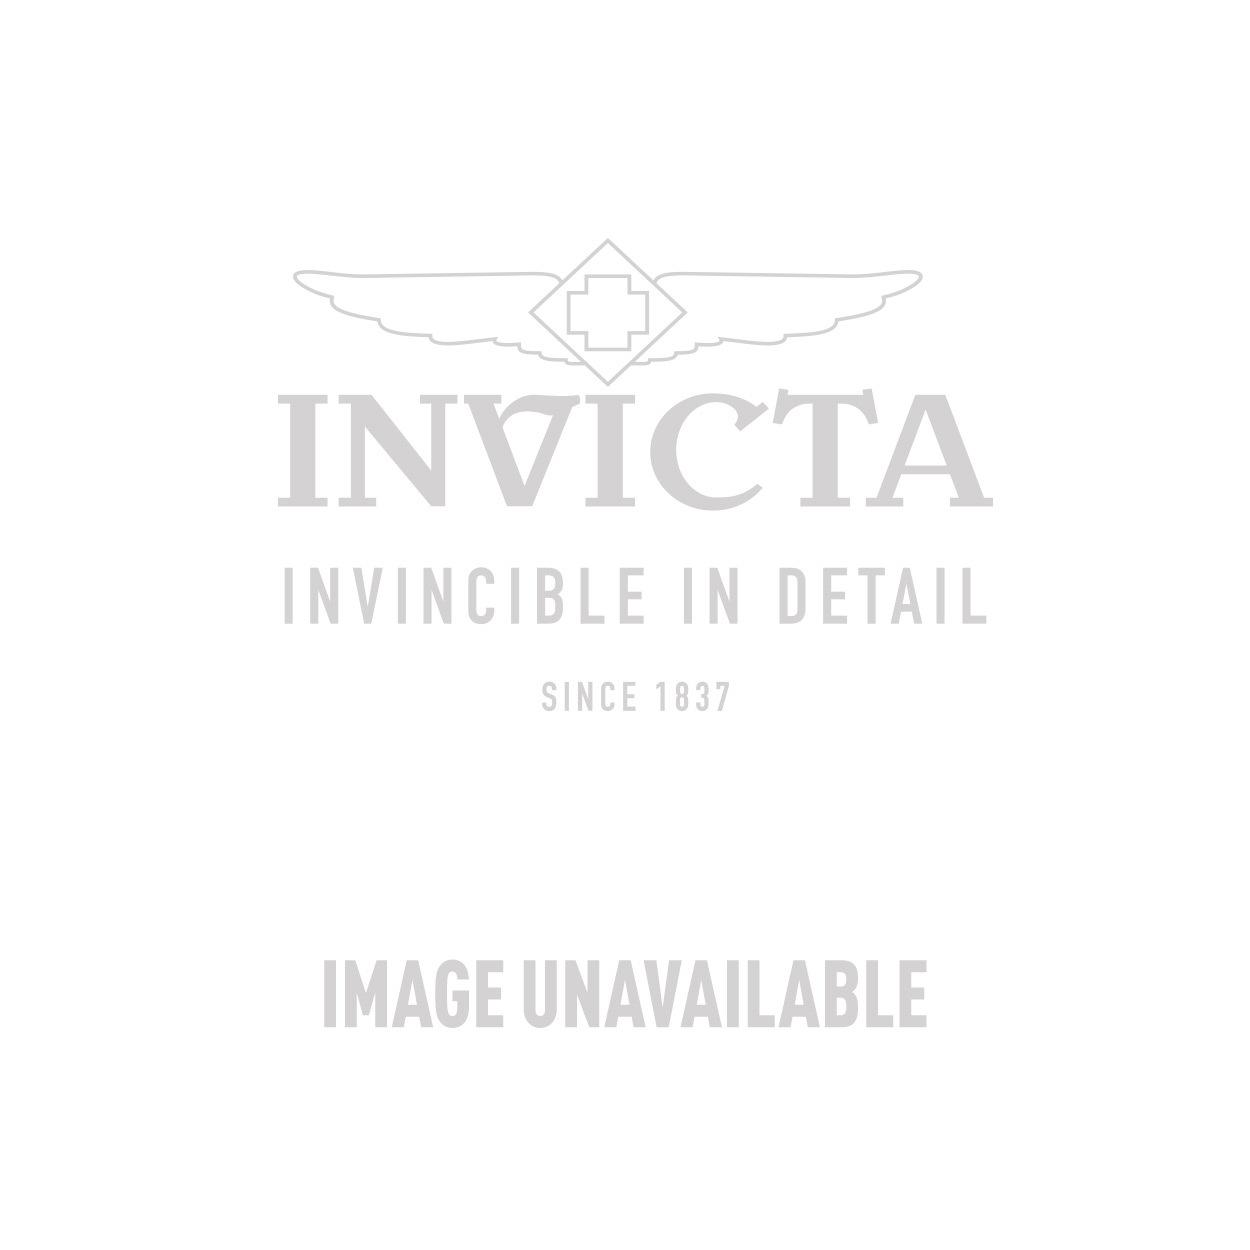 Invicta Excursion Swiss Made Quartz Watch - Blue, Ocean Blue, Titanium case with Grey tone Silicone band - Model 18564